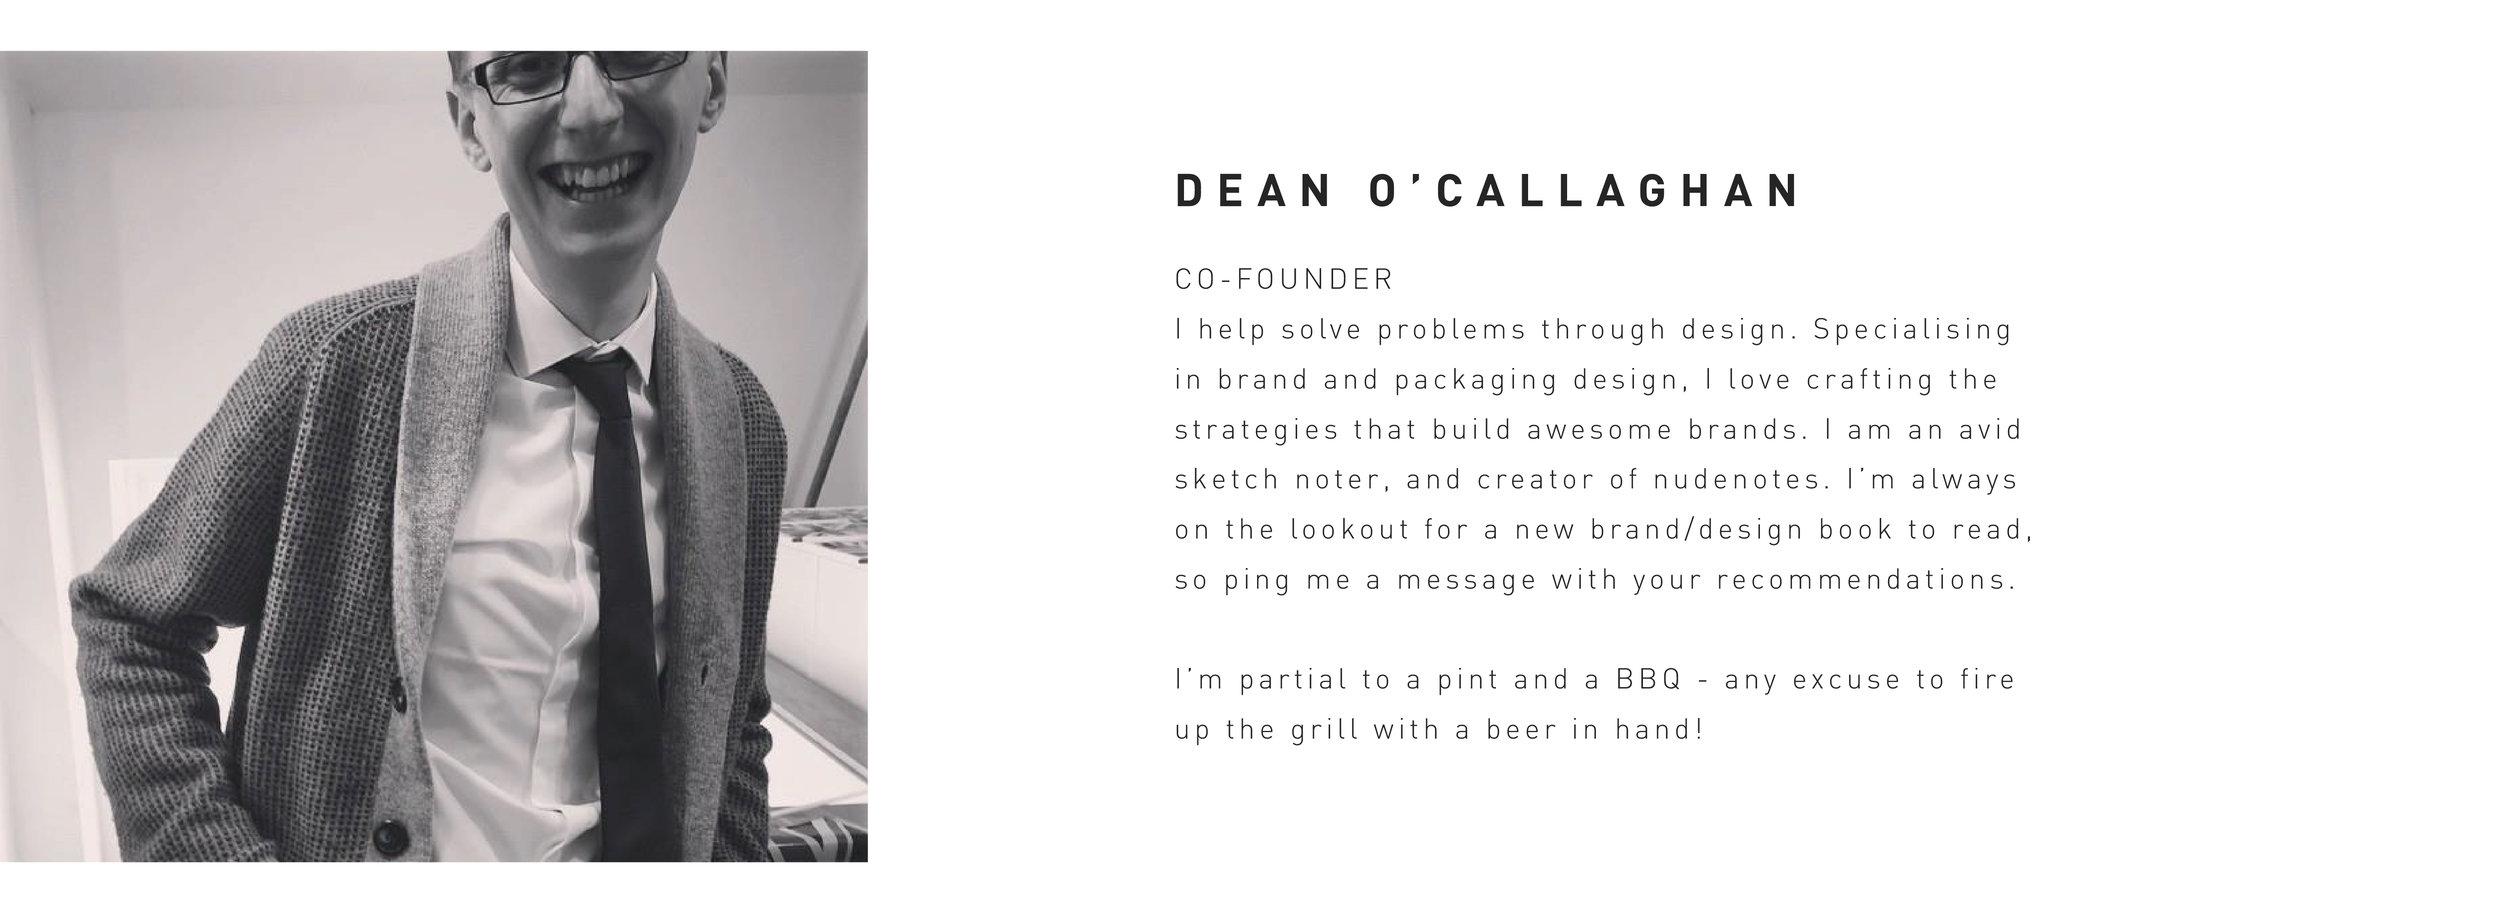 Dean-OCallaghan-profile-signature.jpg